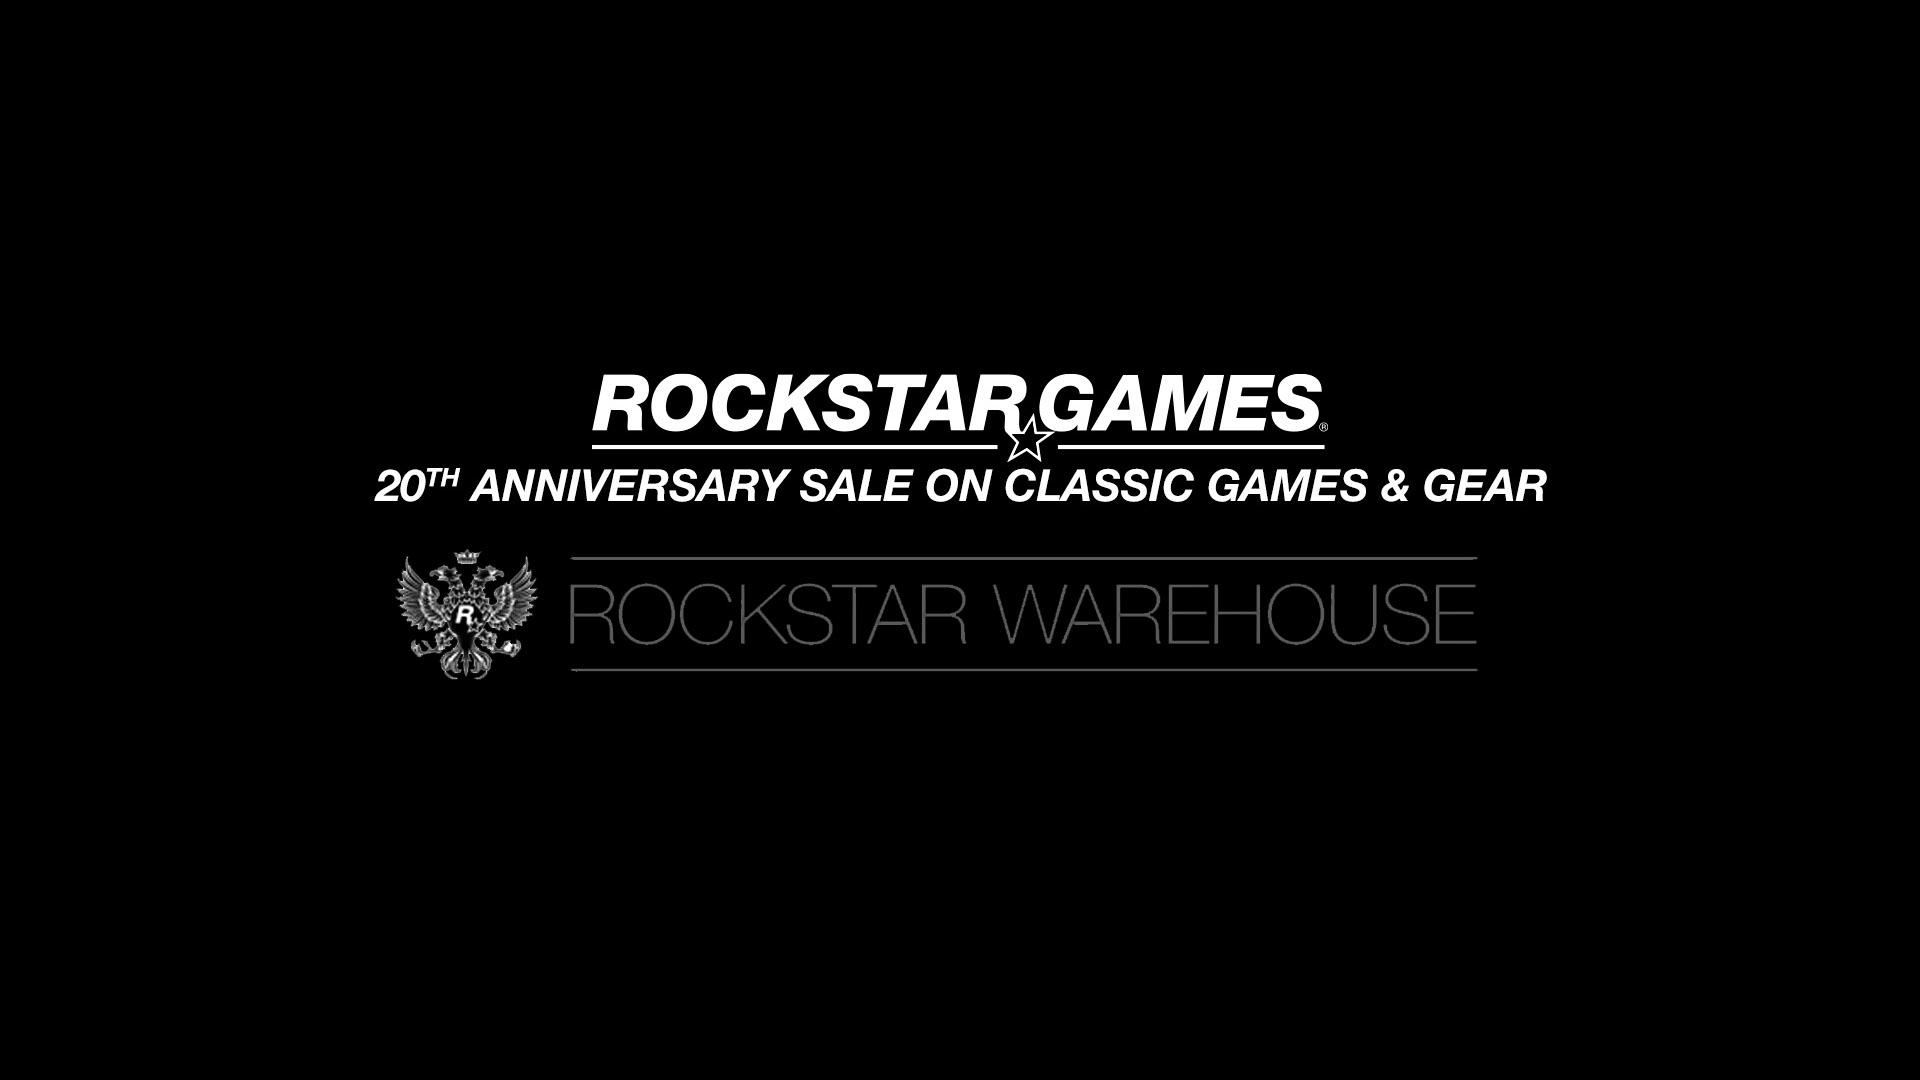 Rockstar Games 20th Anniversary Rockstar Warehouse